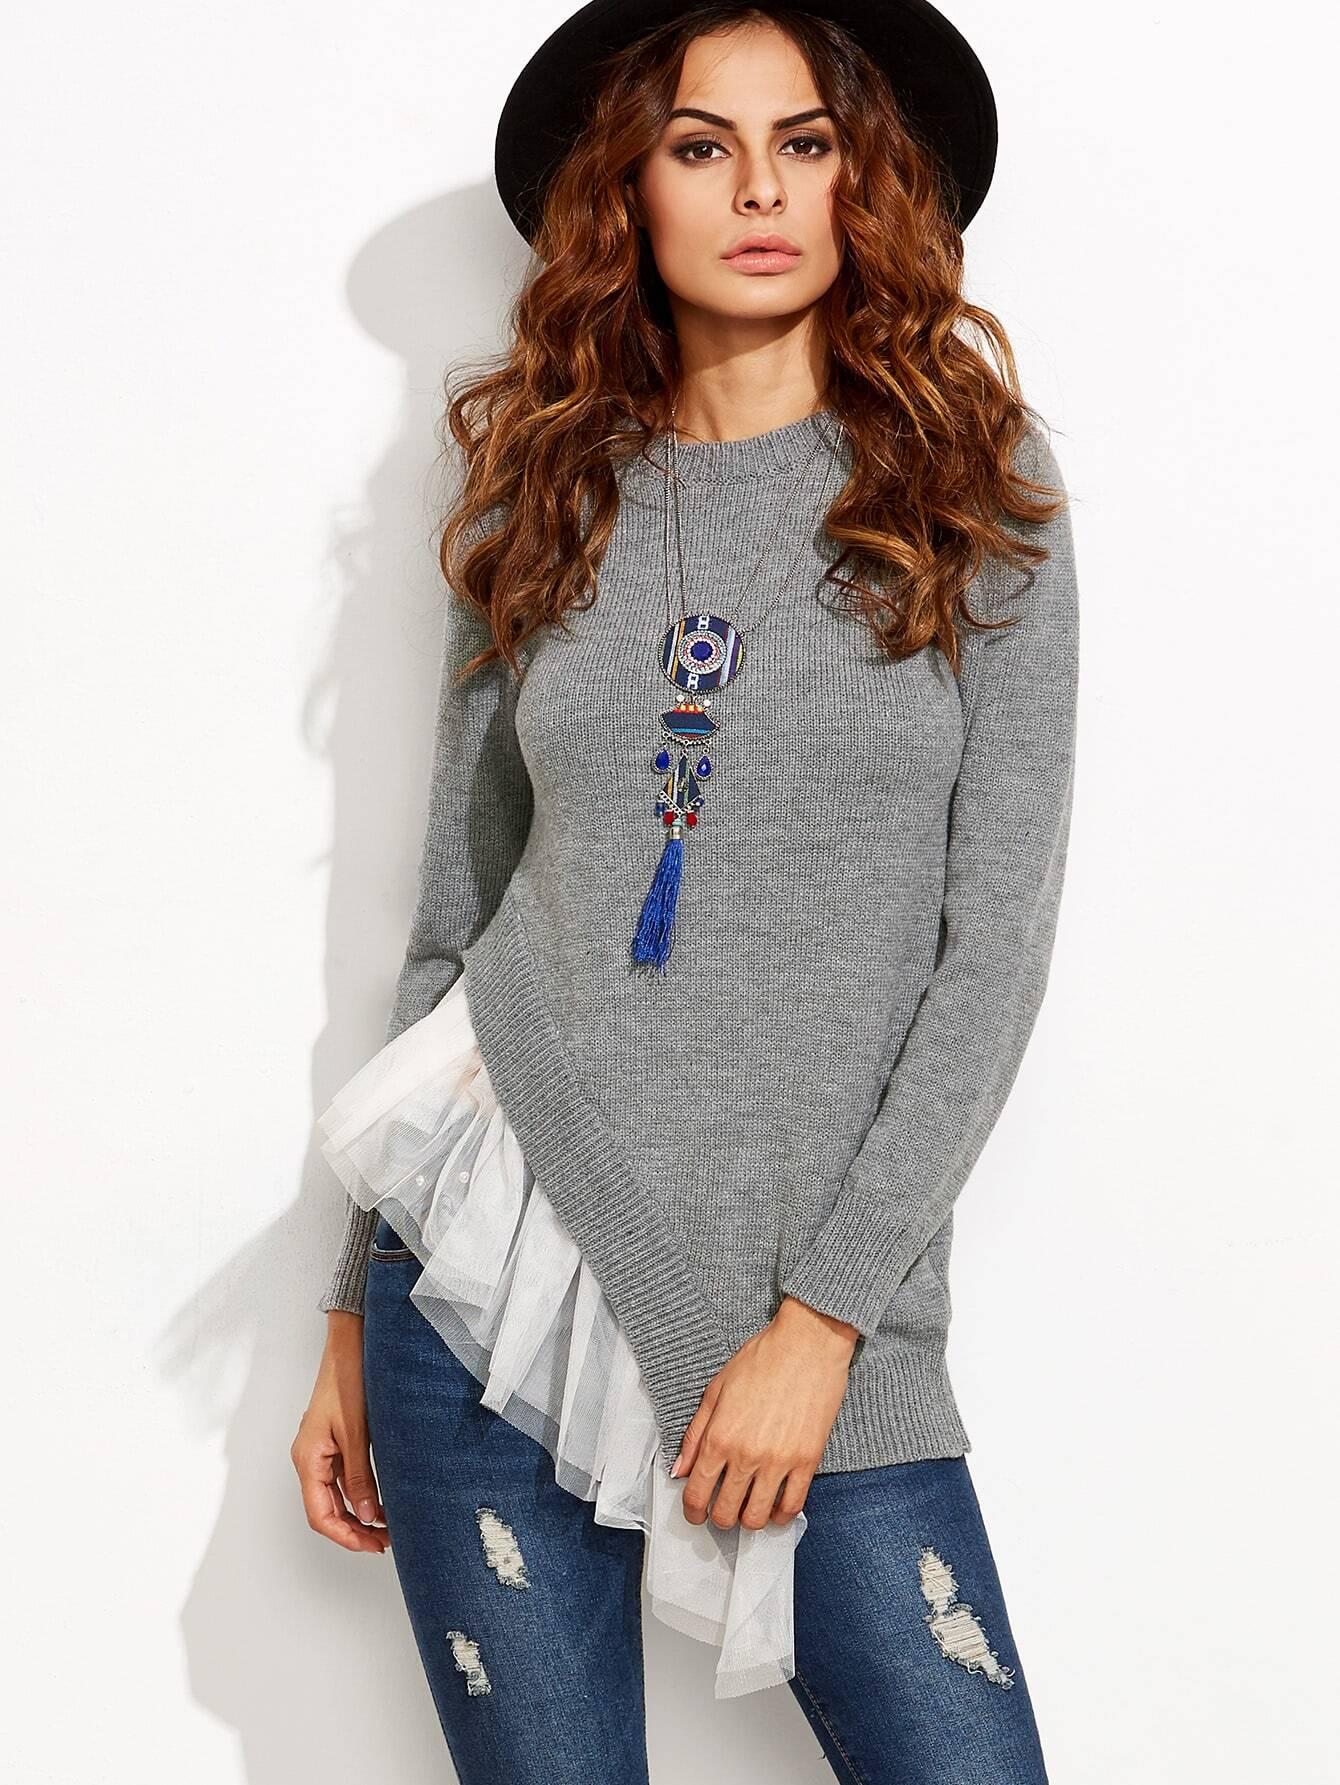 Grey Contrast Mesh Trim Asymmetric Pullover Sweater sweater160811706